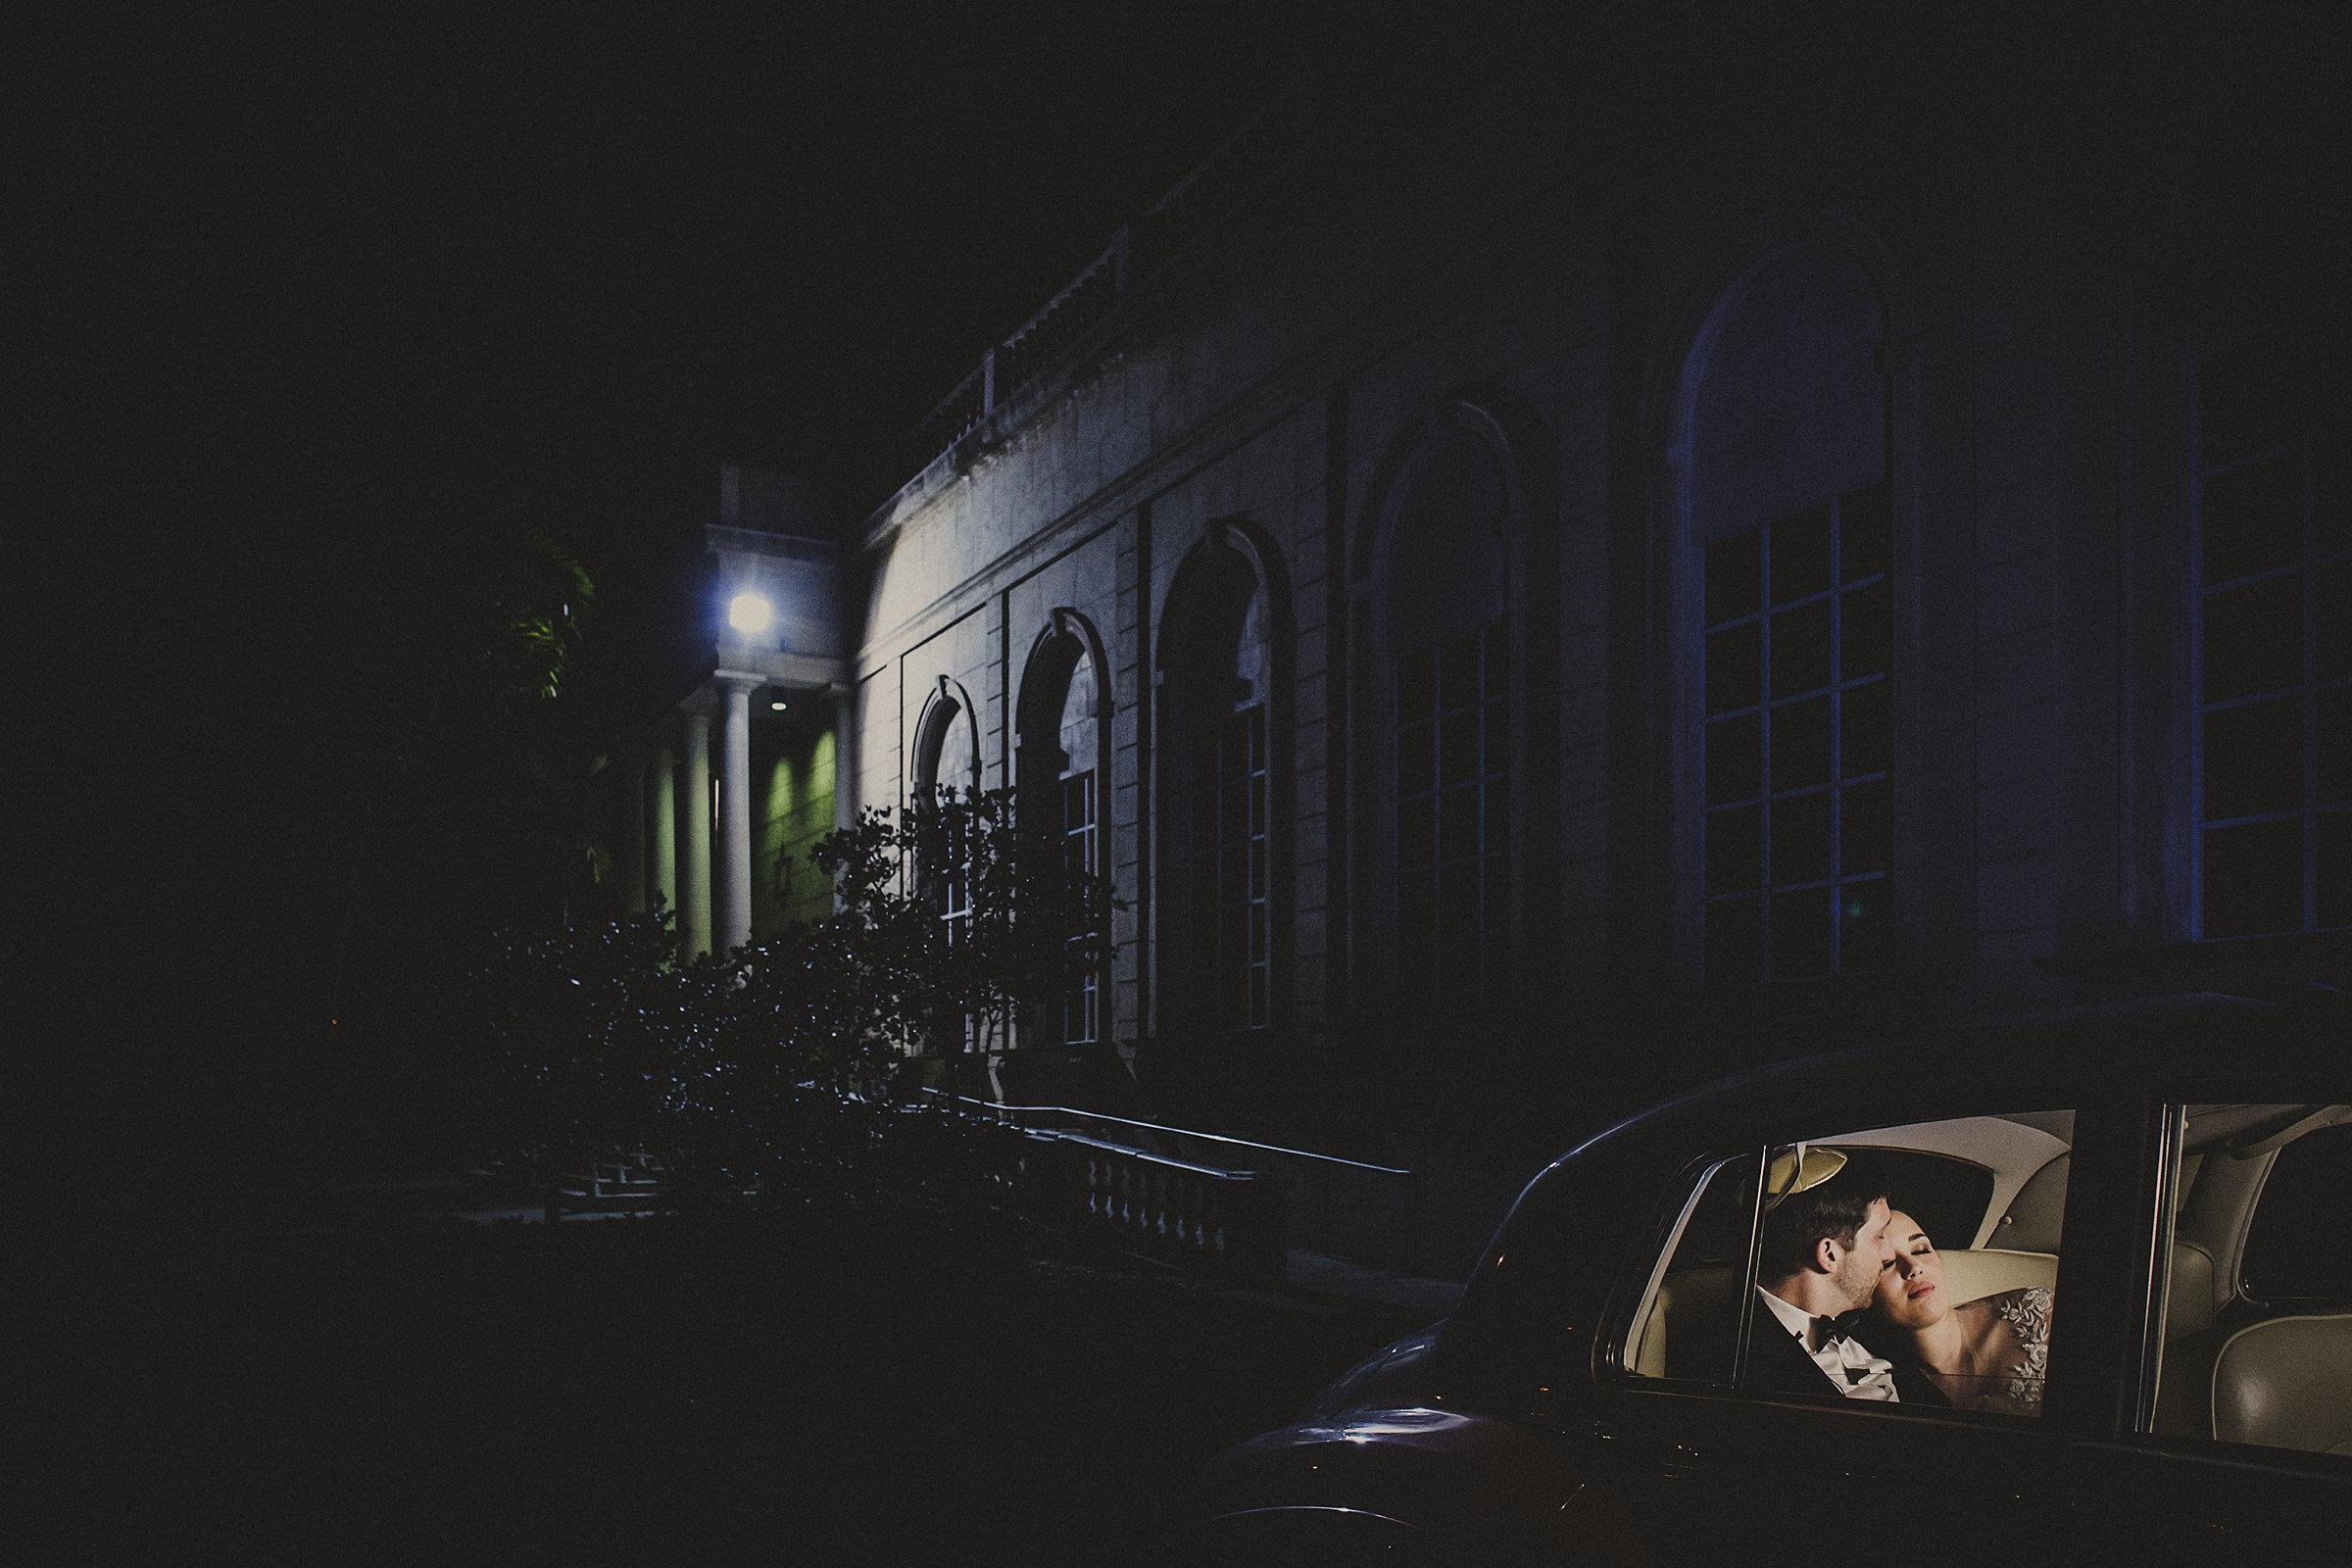 Creative composition lighting couple in antique car - photo by El Marco Rojo